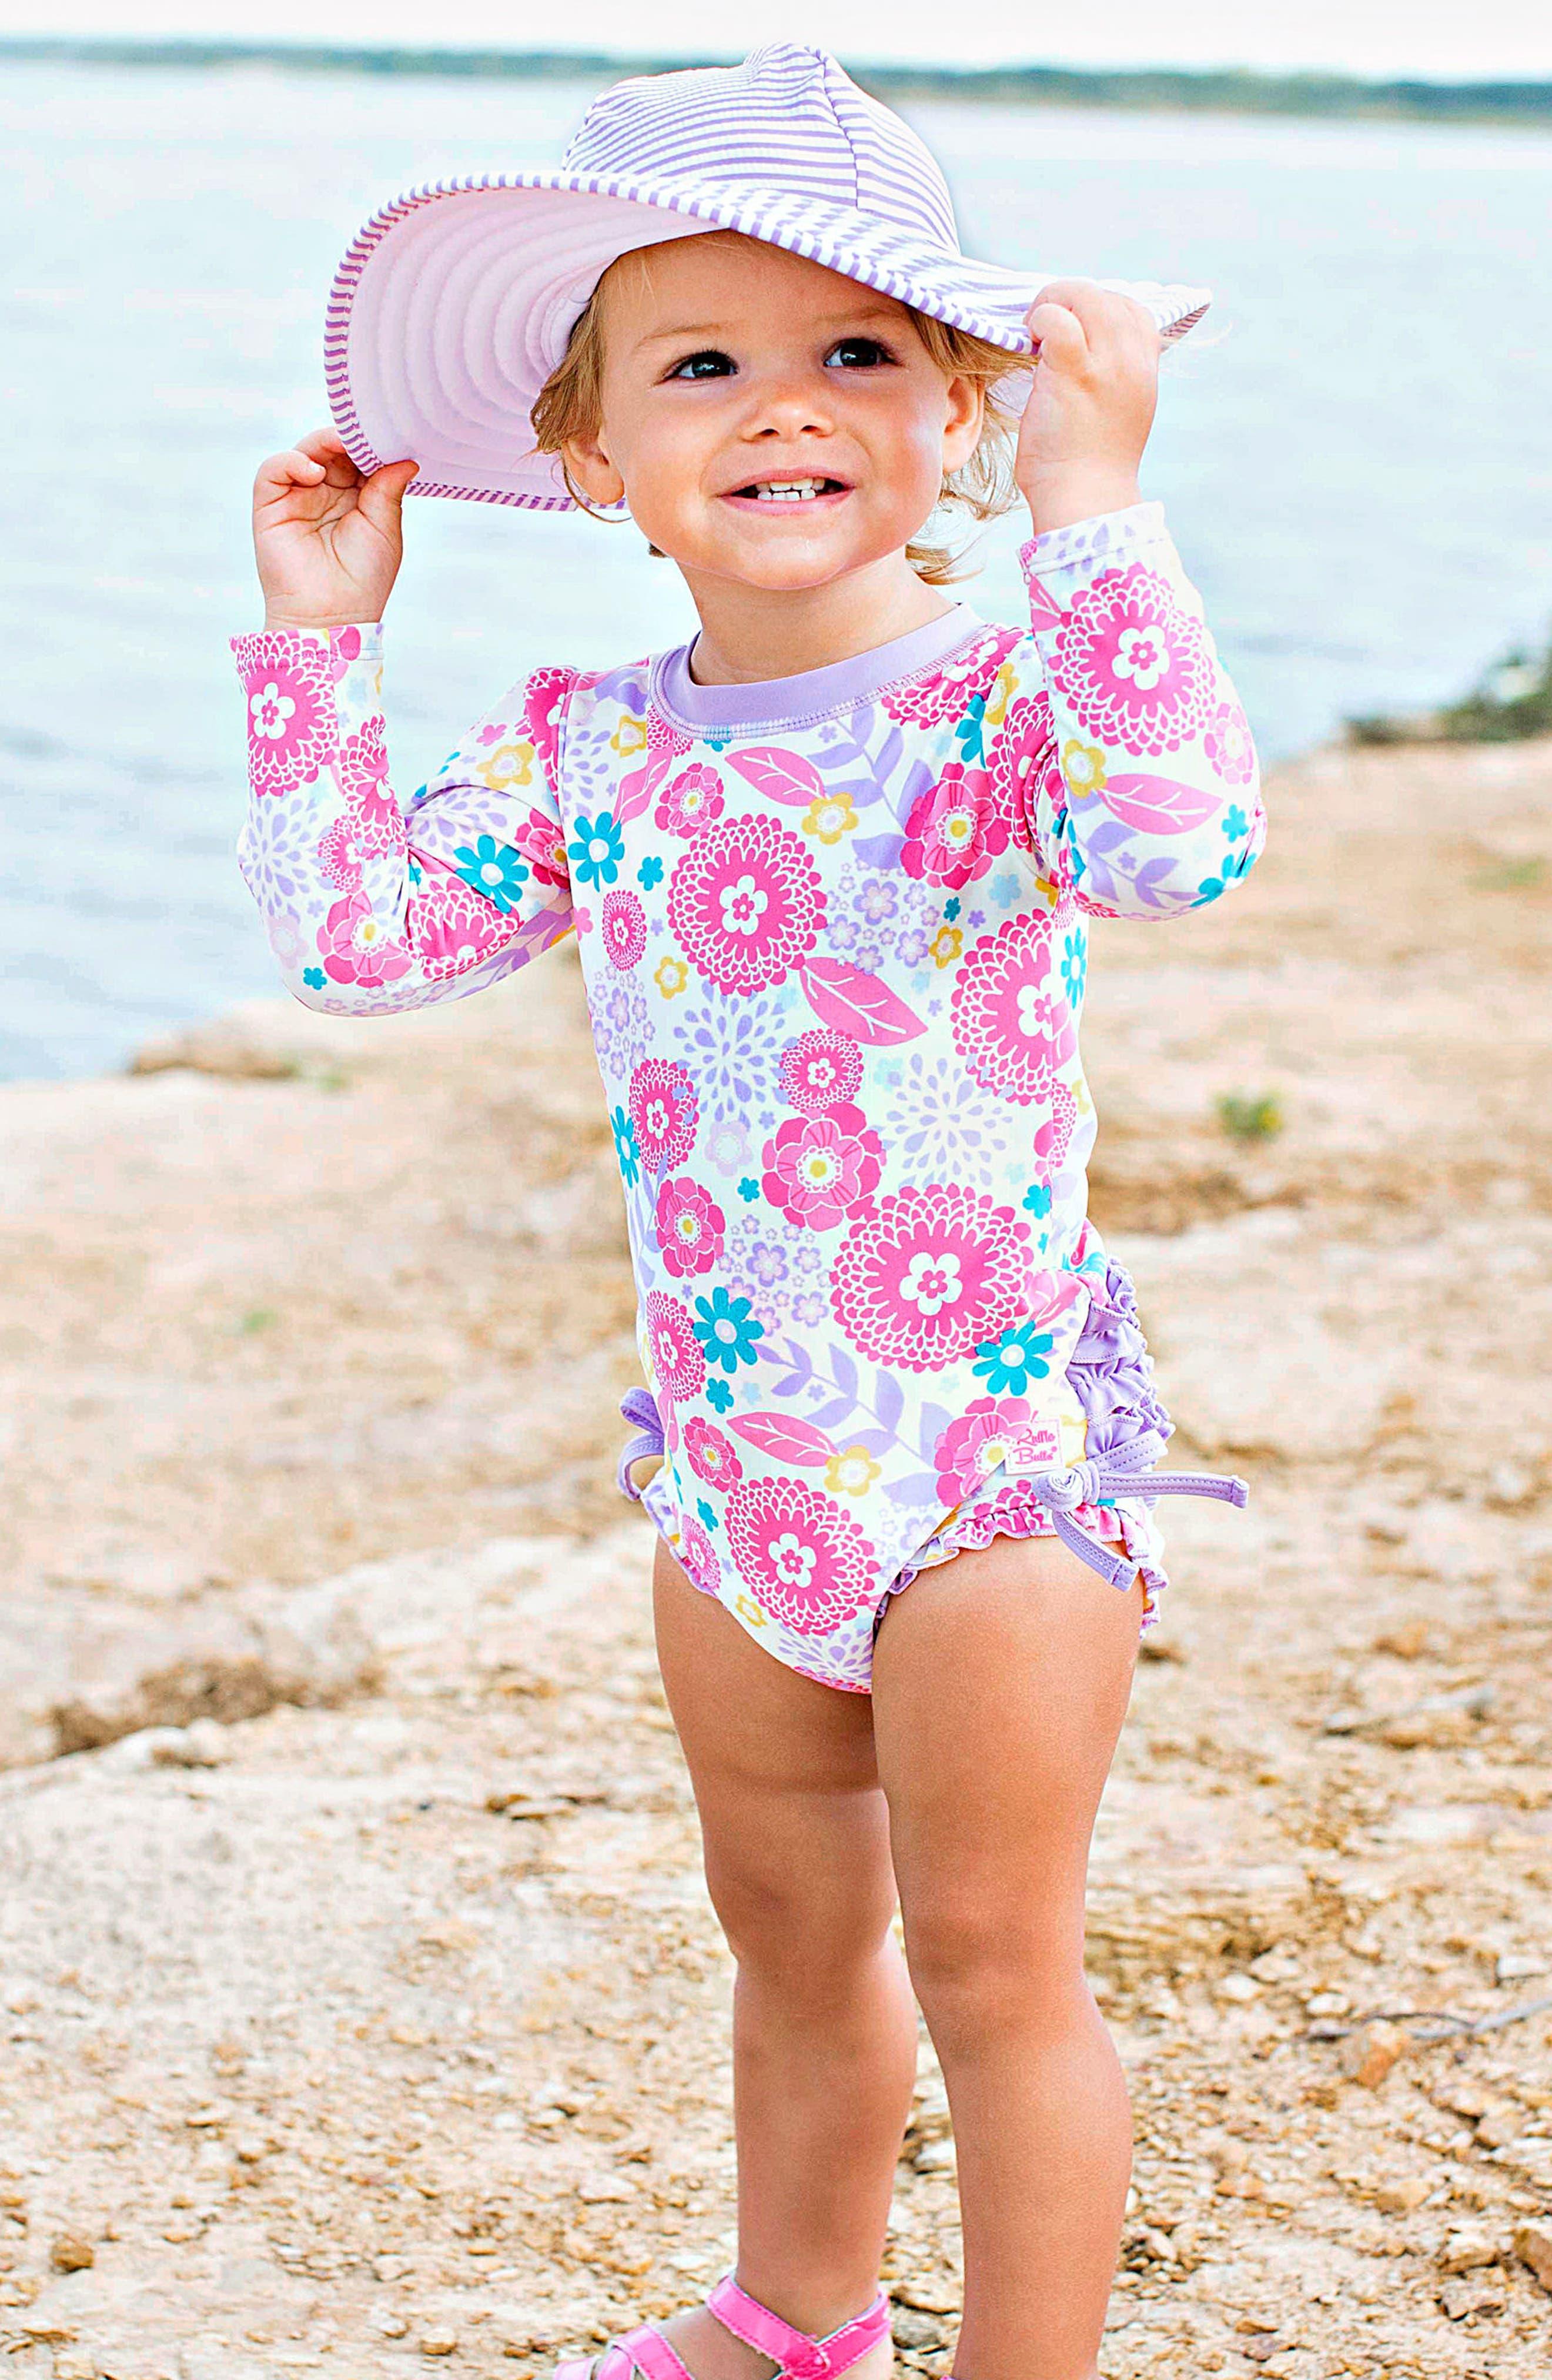 Alternate Image 2  - RuffleButts Blooming Buttercups One-Piece Rashguard Swimsuit & Hat Set (Baby Girls)